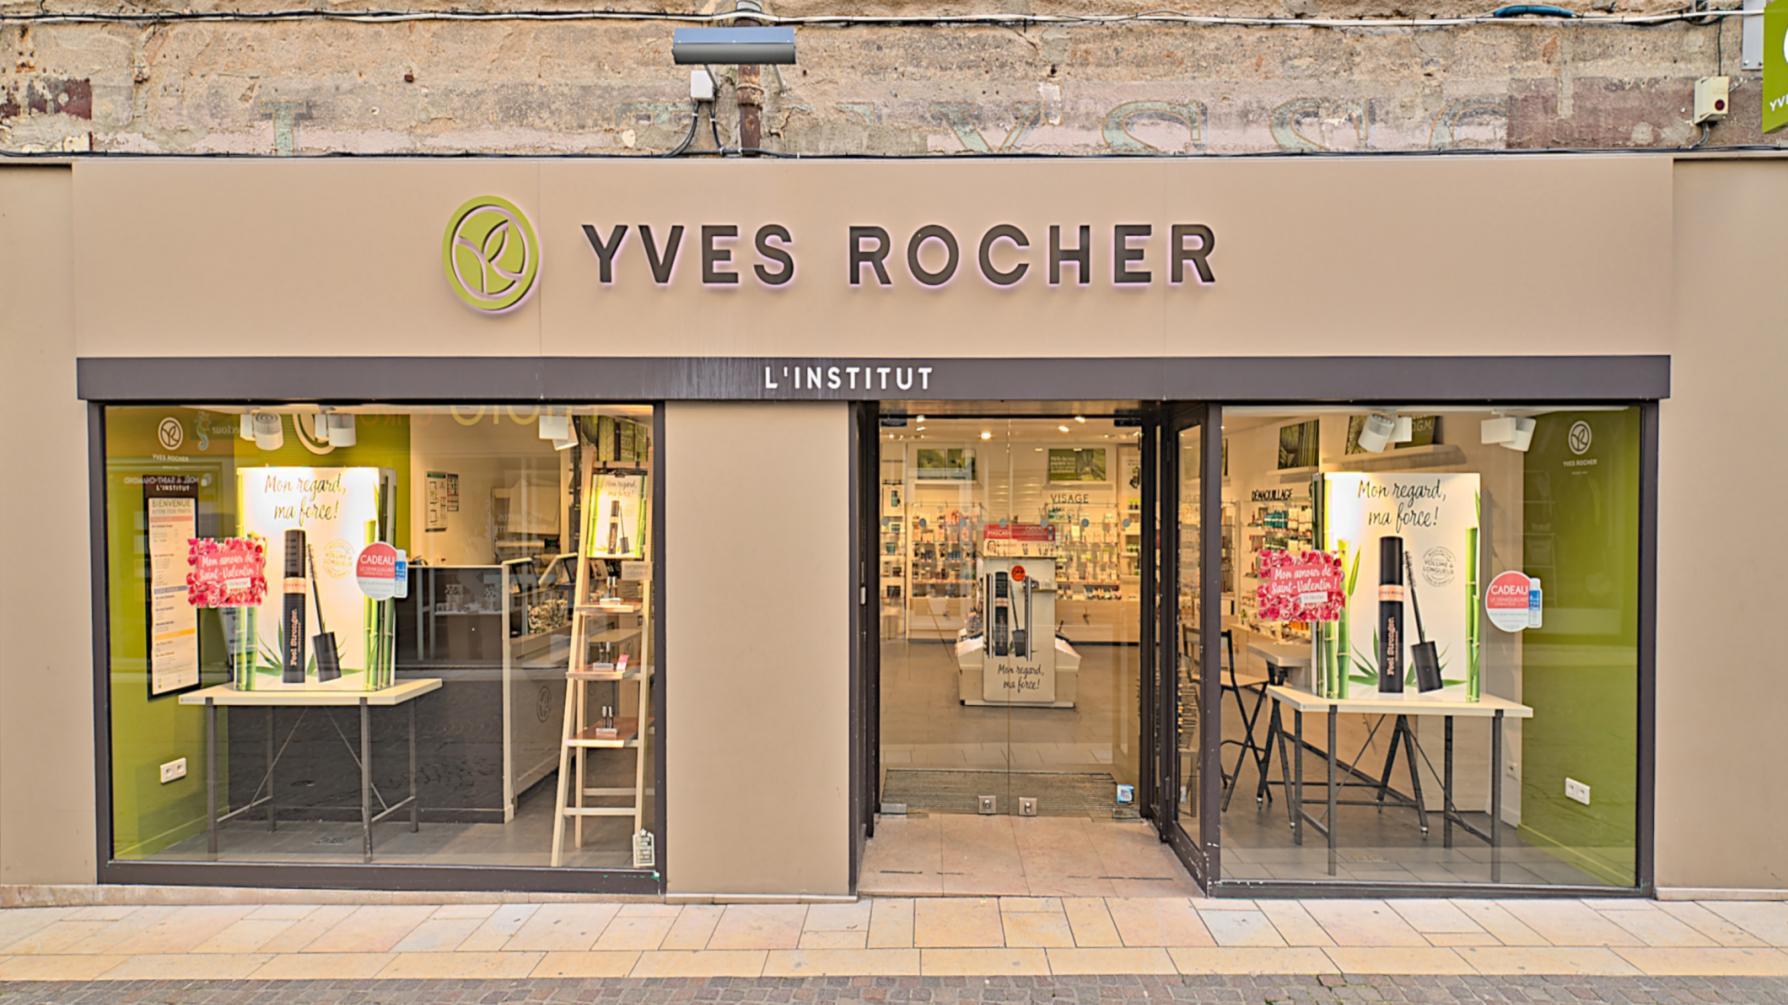 Yves Rocher Saint Chamond